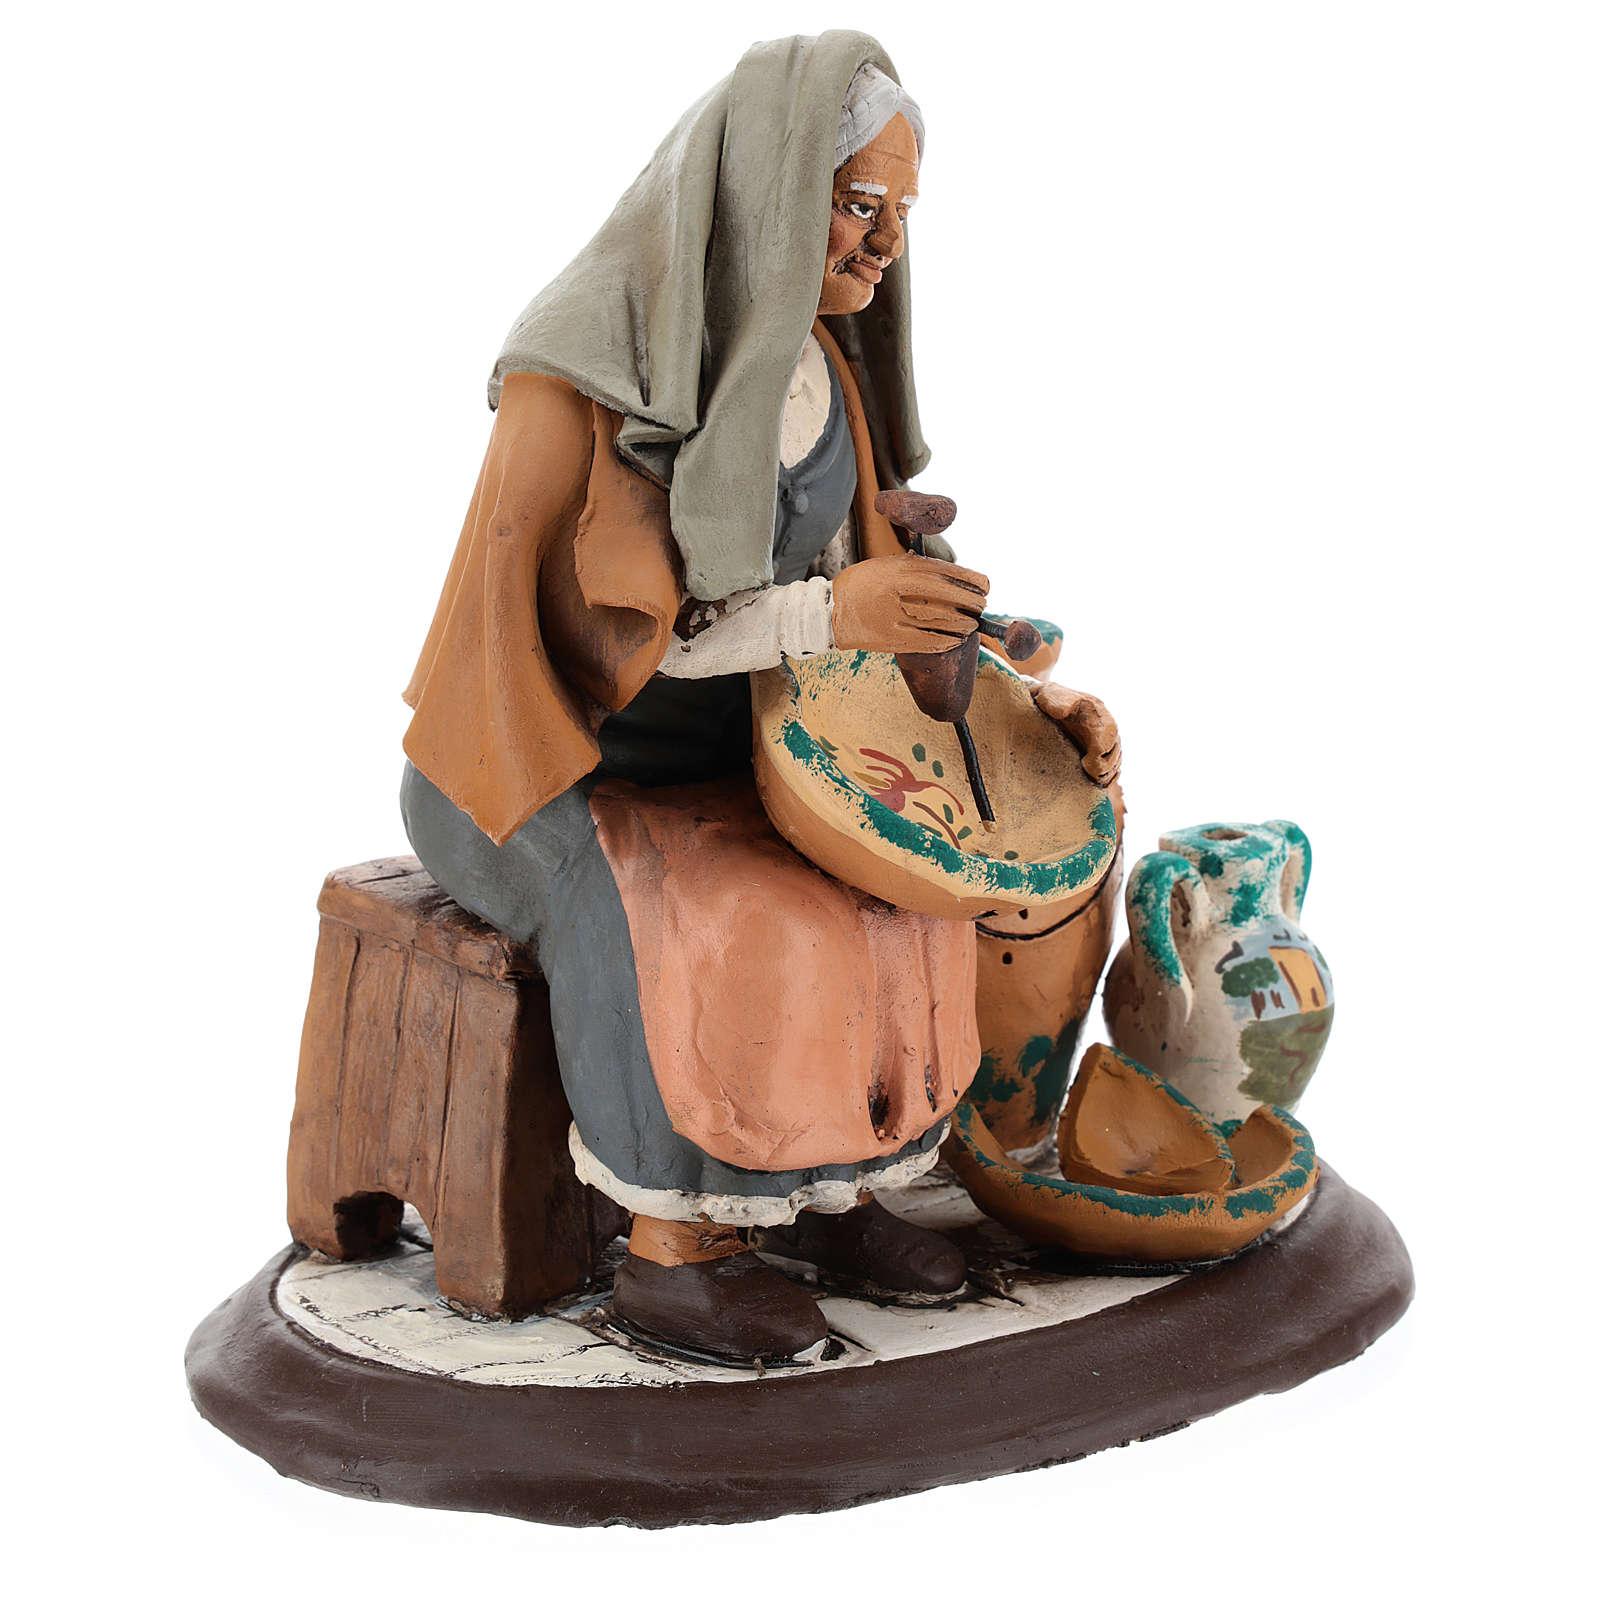 Pittrice per presepe 30 cm terracotta decorata Deruta 4